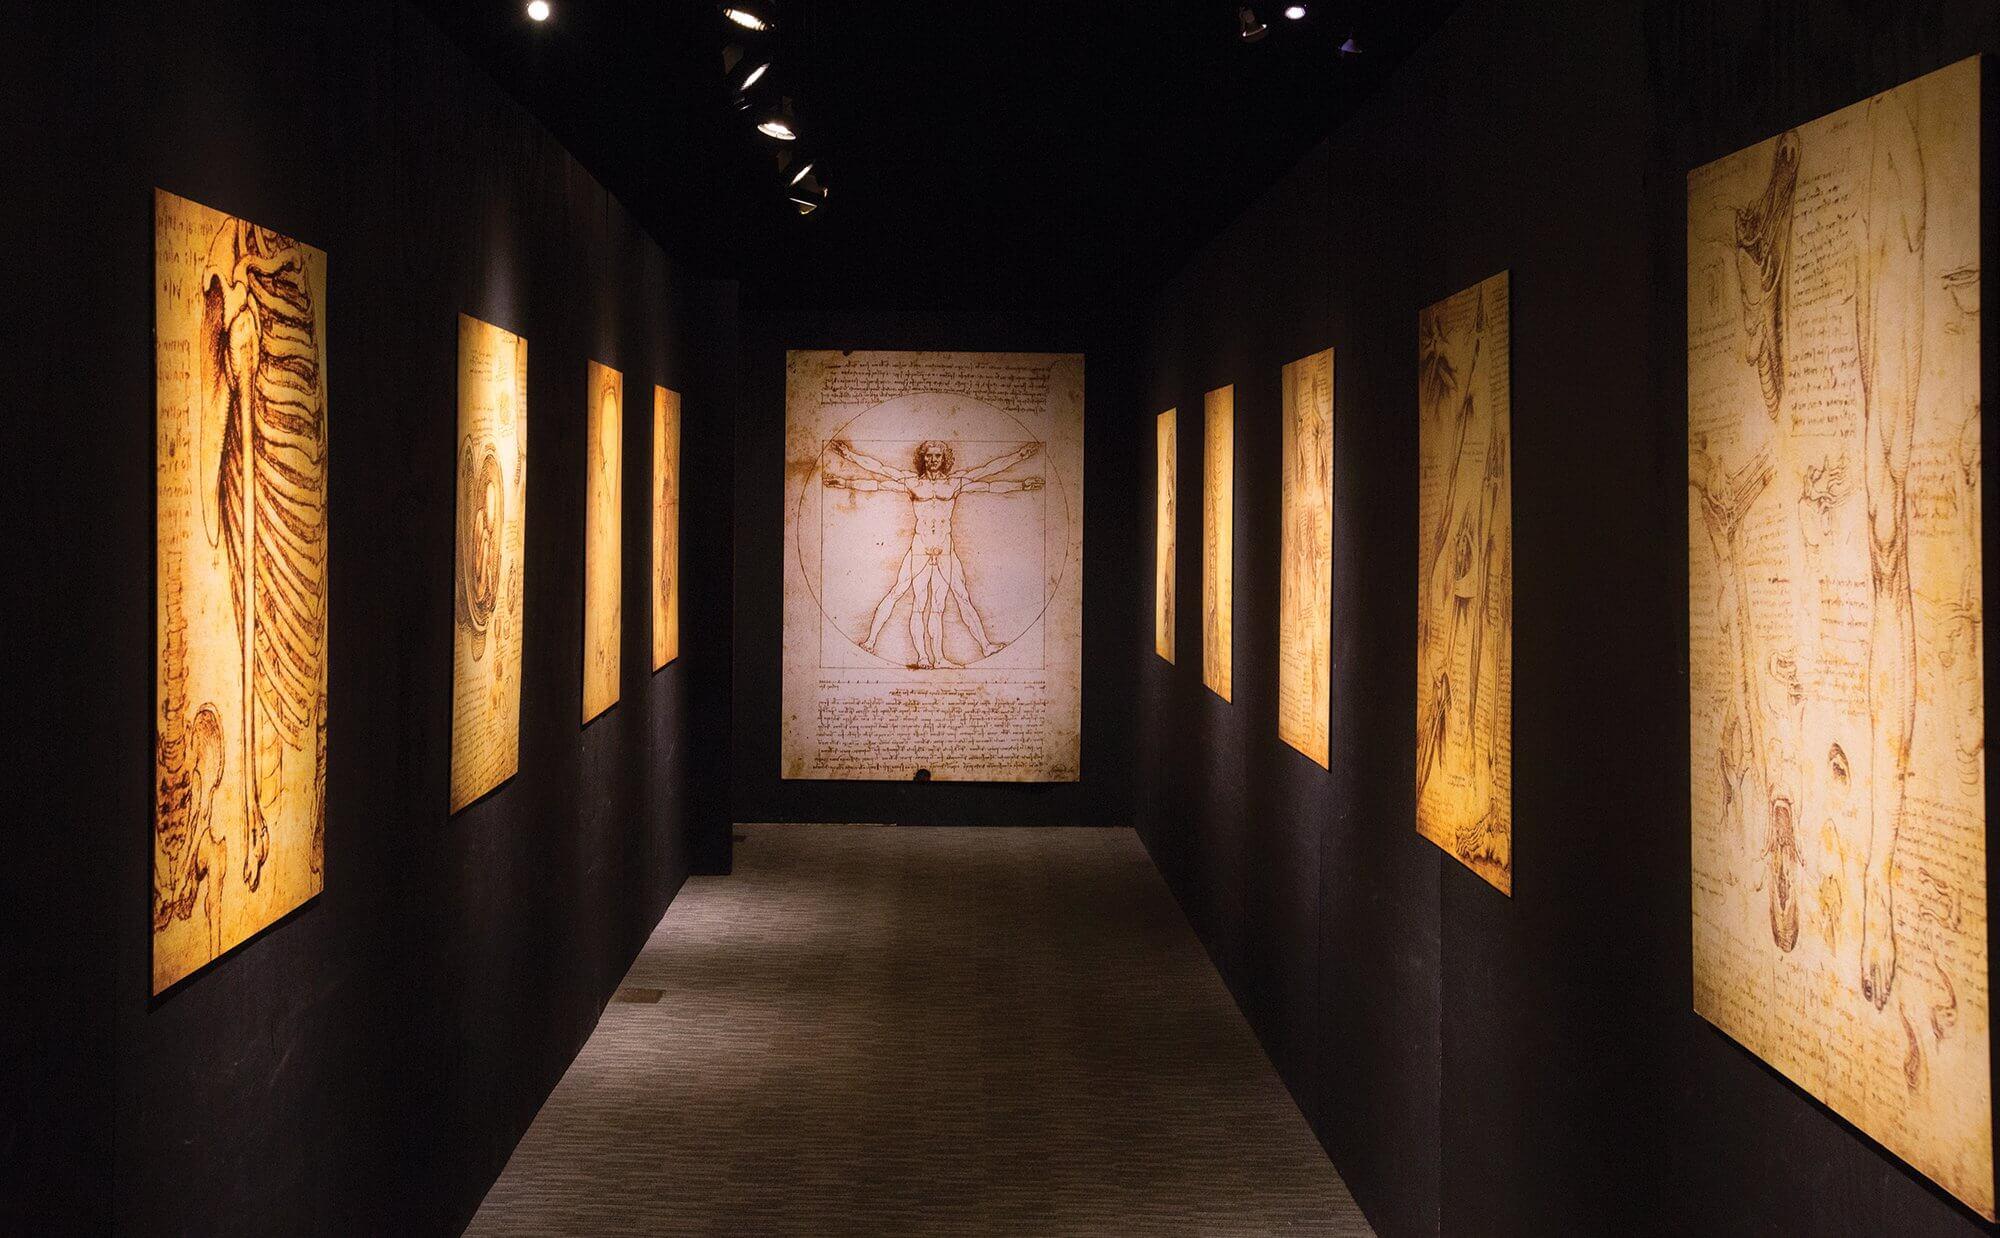 A reproduction of da Vinci's Vitruvian Man hangs in the exhibition.